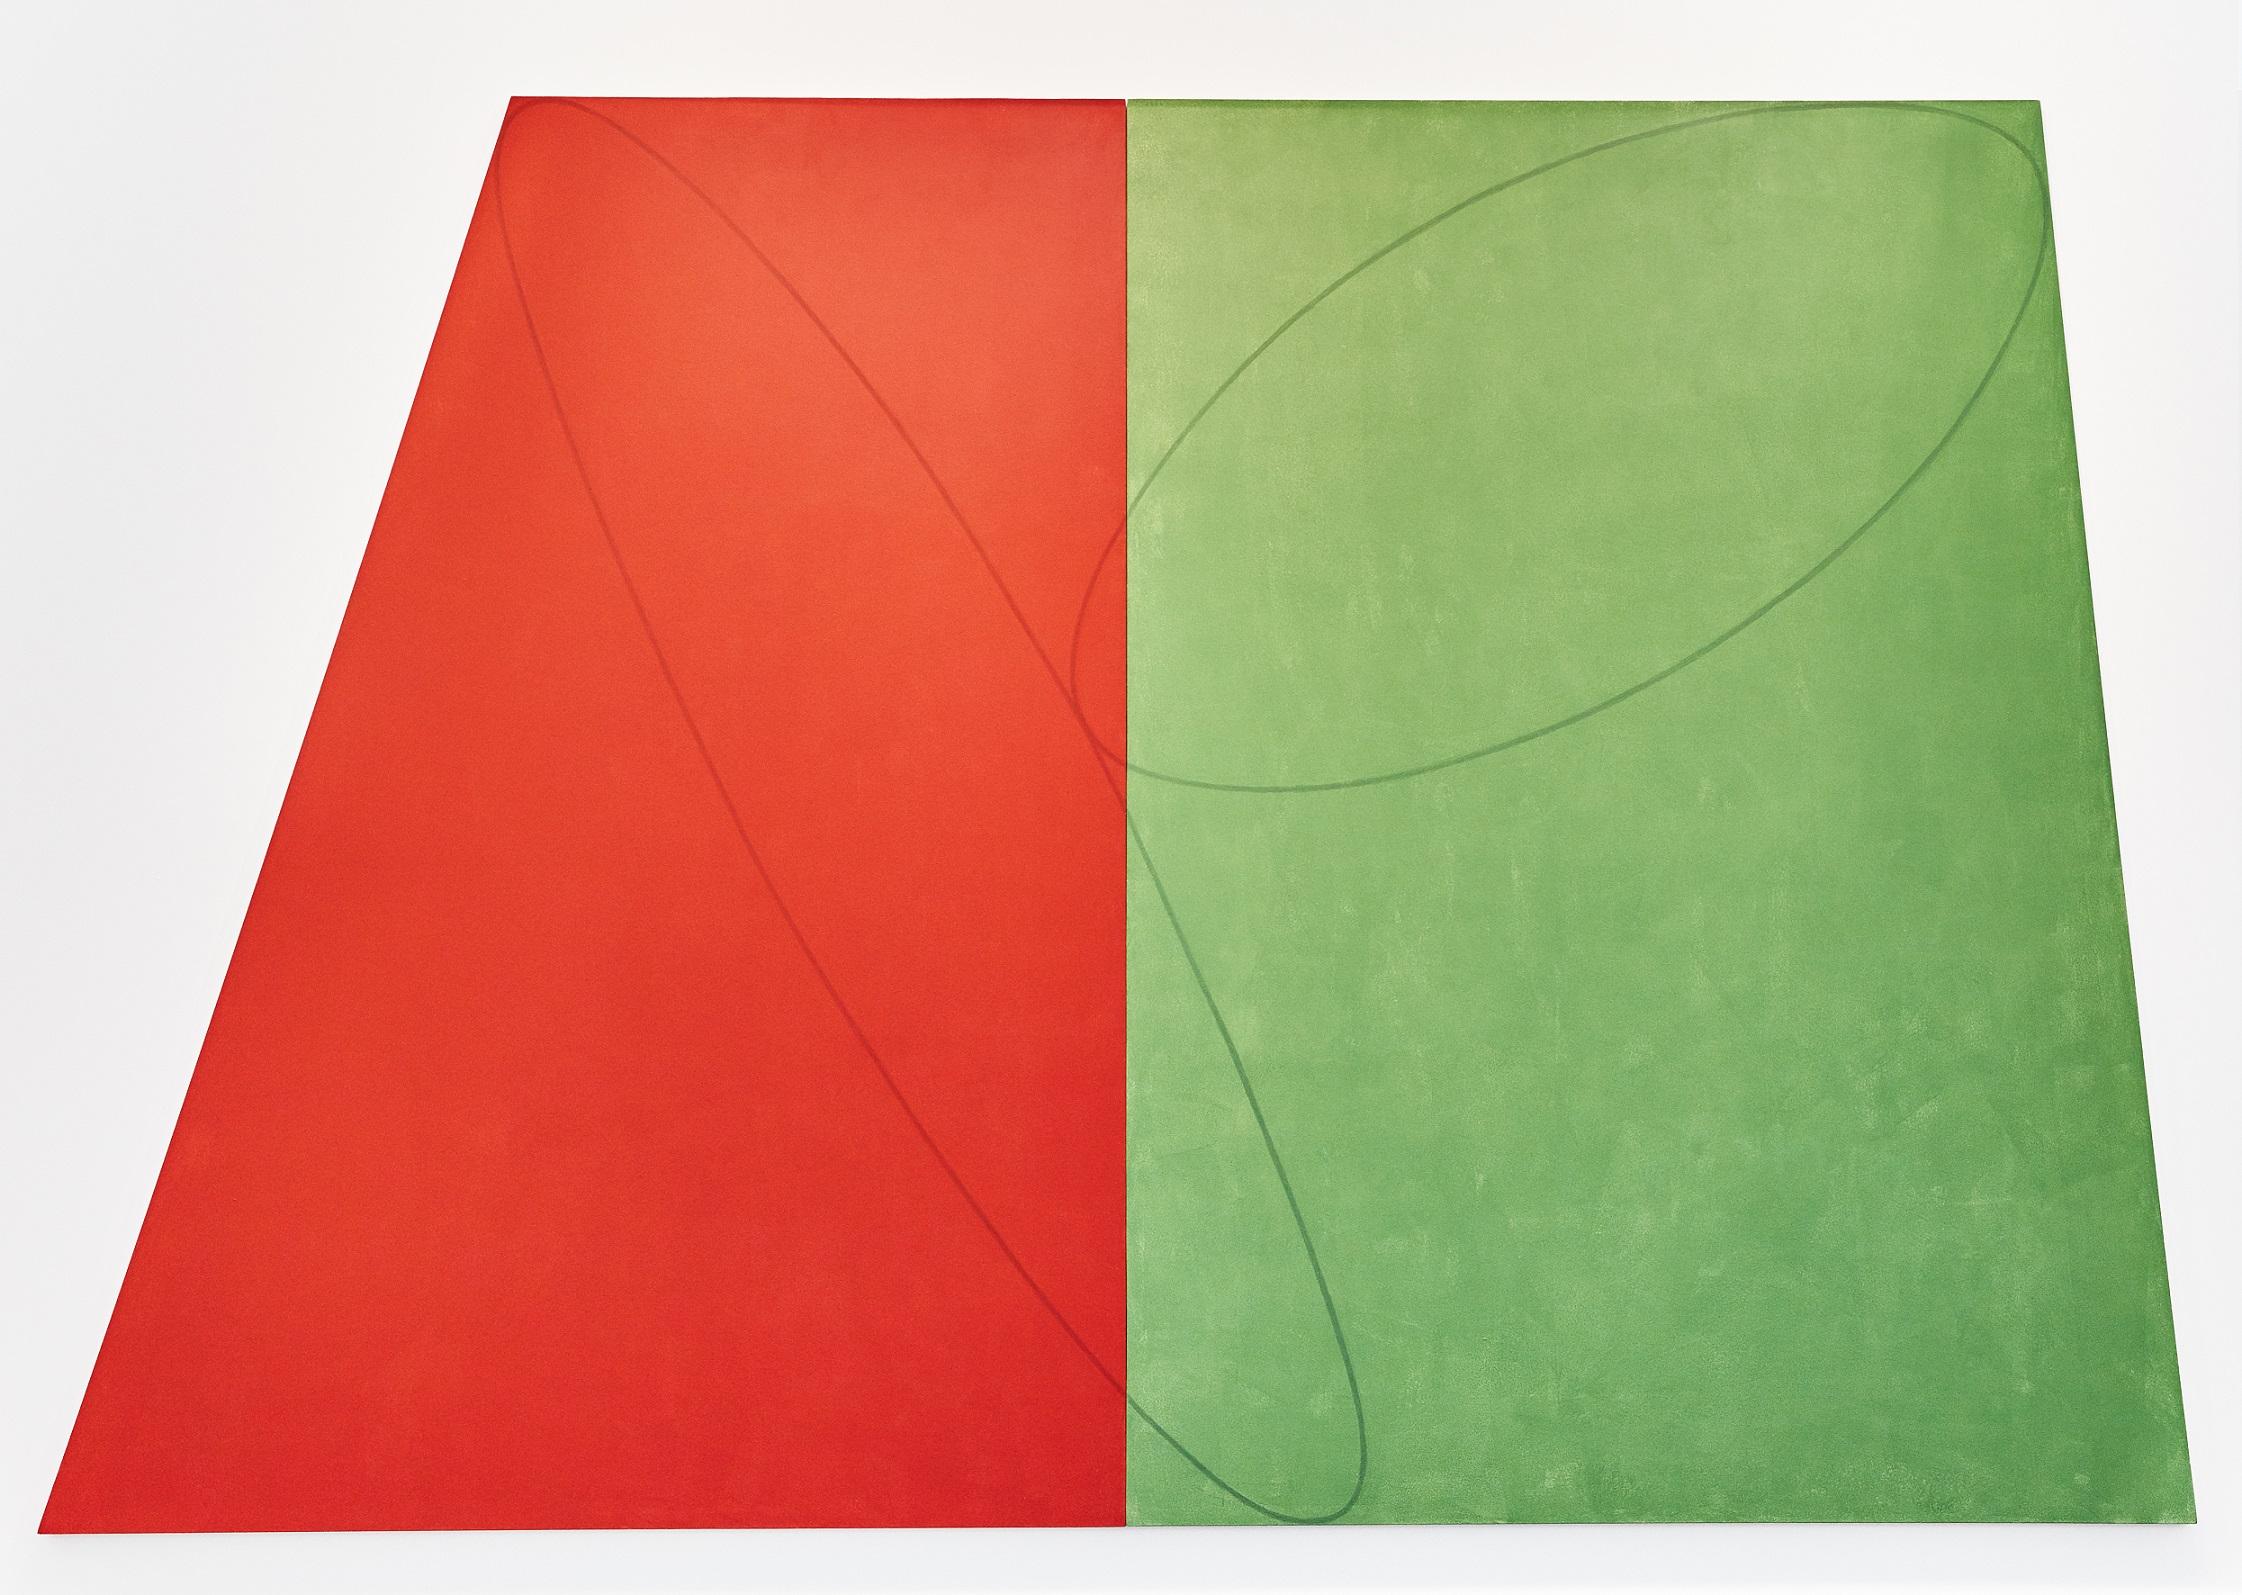 Robert Mangold. Plane - Figure Series A (Double Panel), 1993.